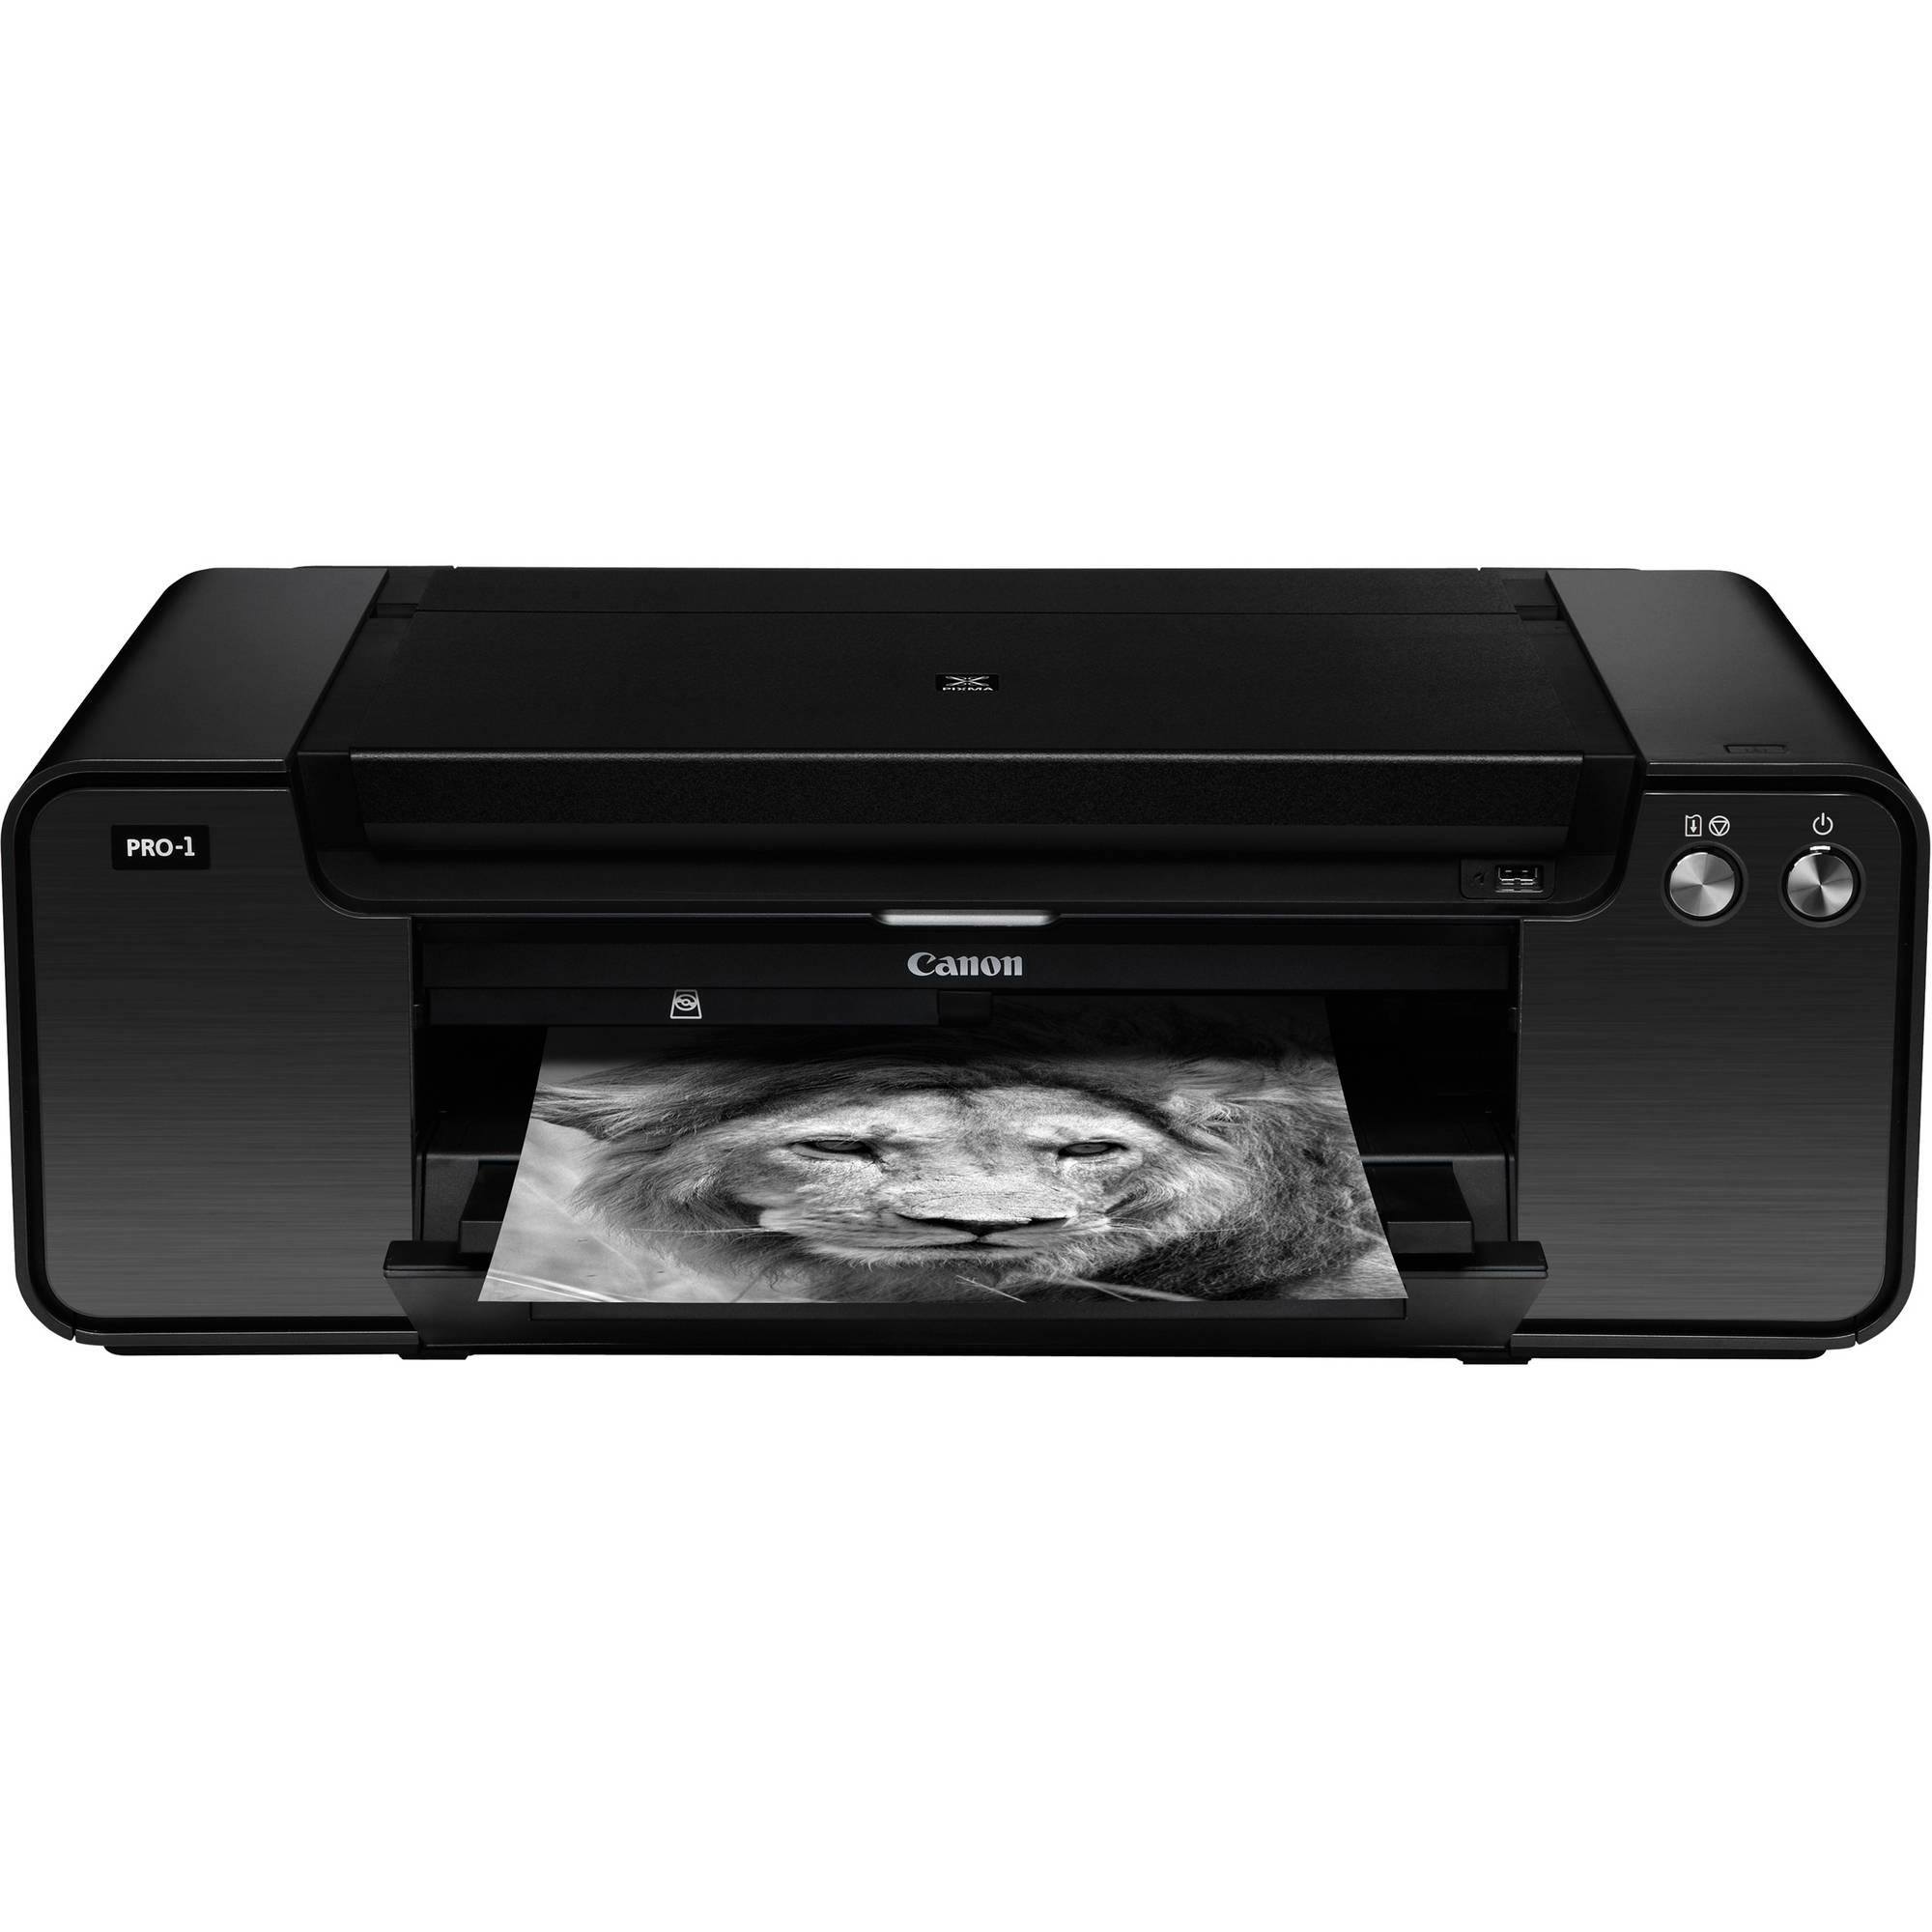 Canon PIXMA PRO-1 Network Professional Inkjet Photo Printer